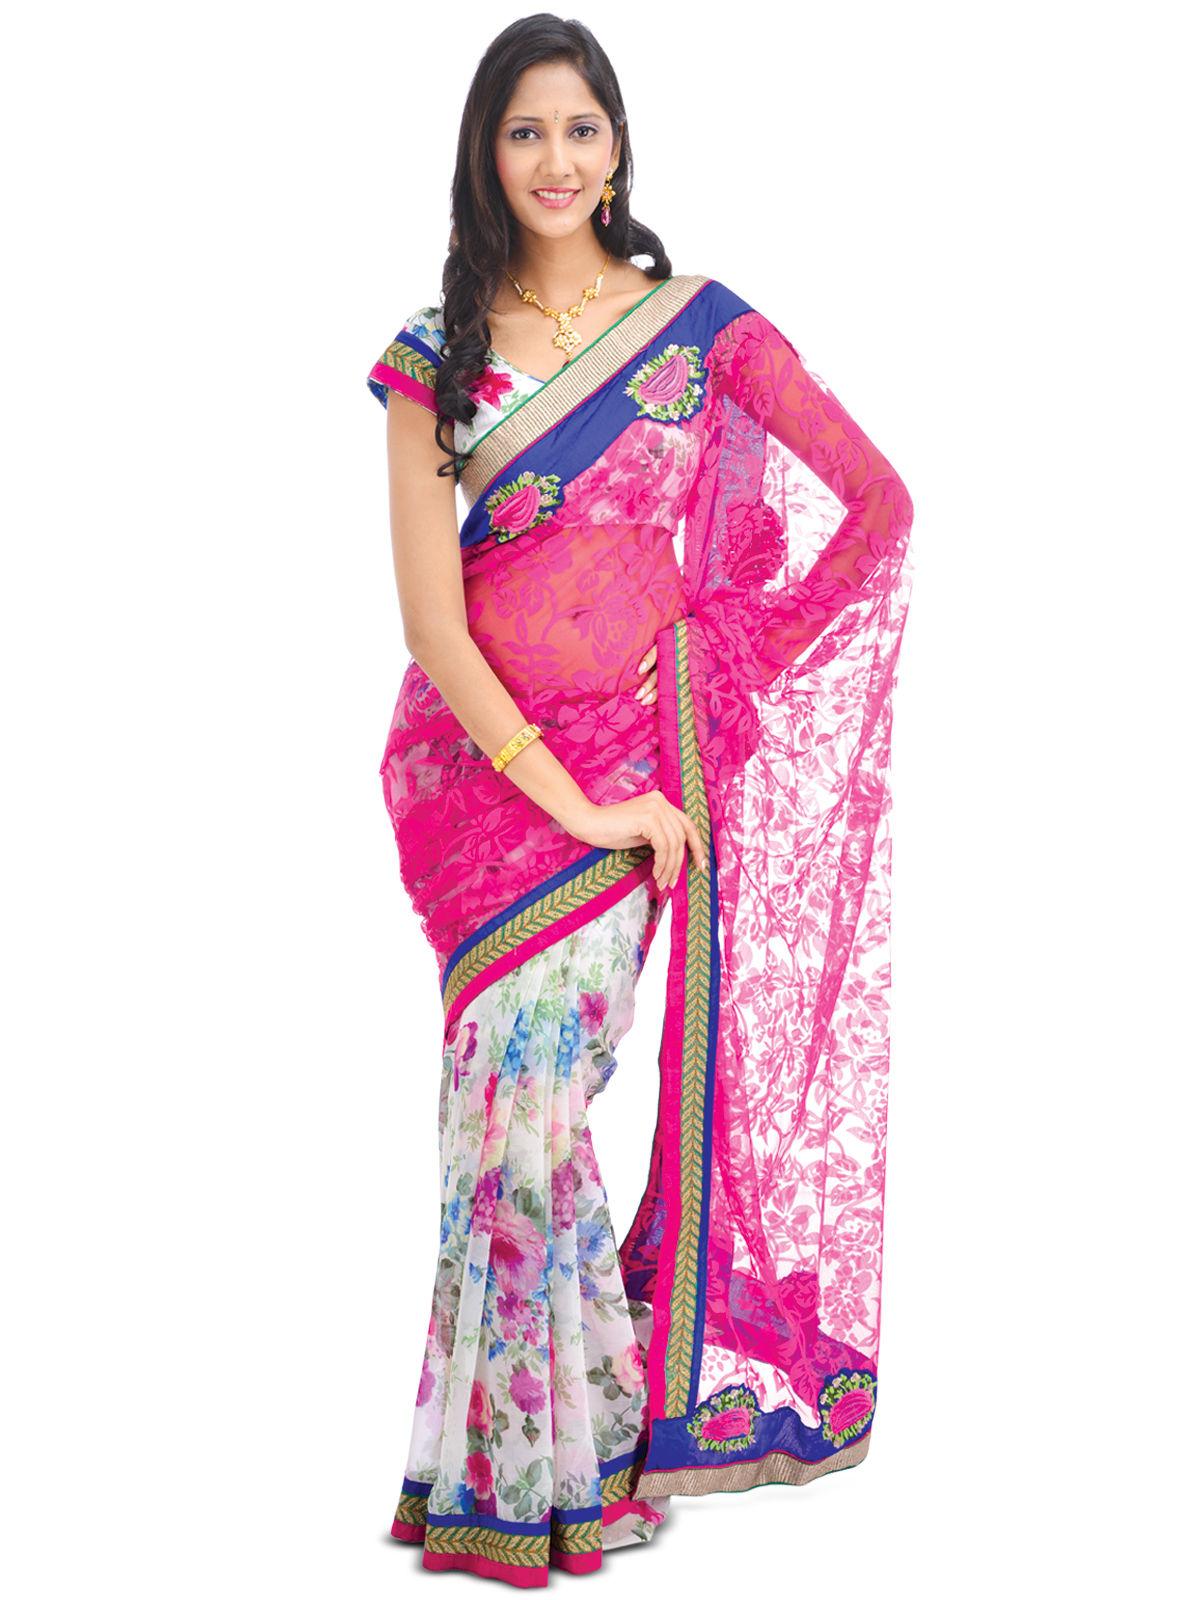 Buy Elegant Designer Wear Bollywood Saree Bds1 Online At Best Price In India On